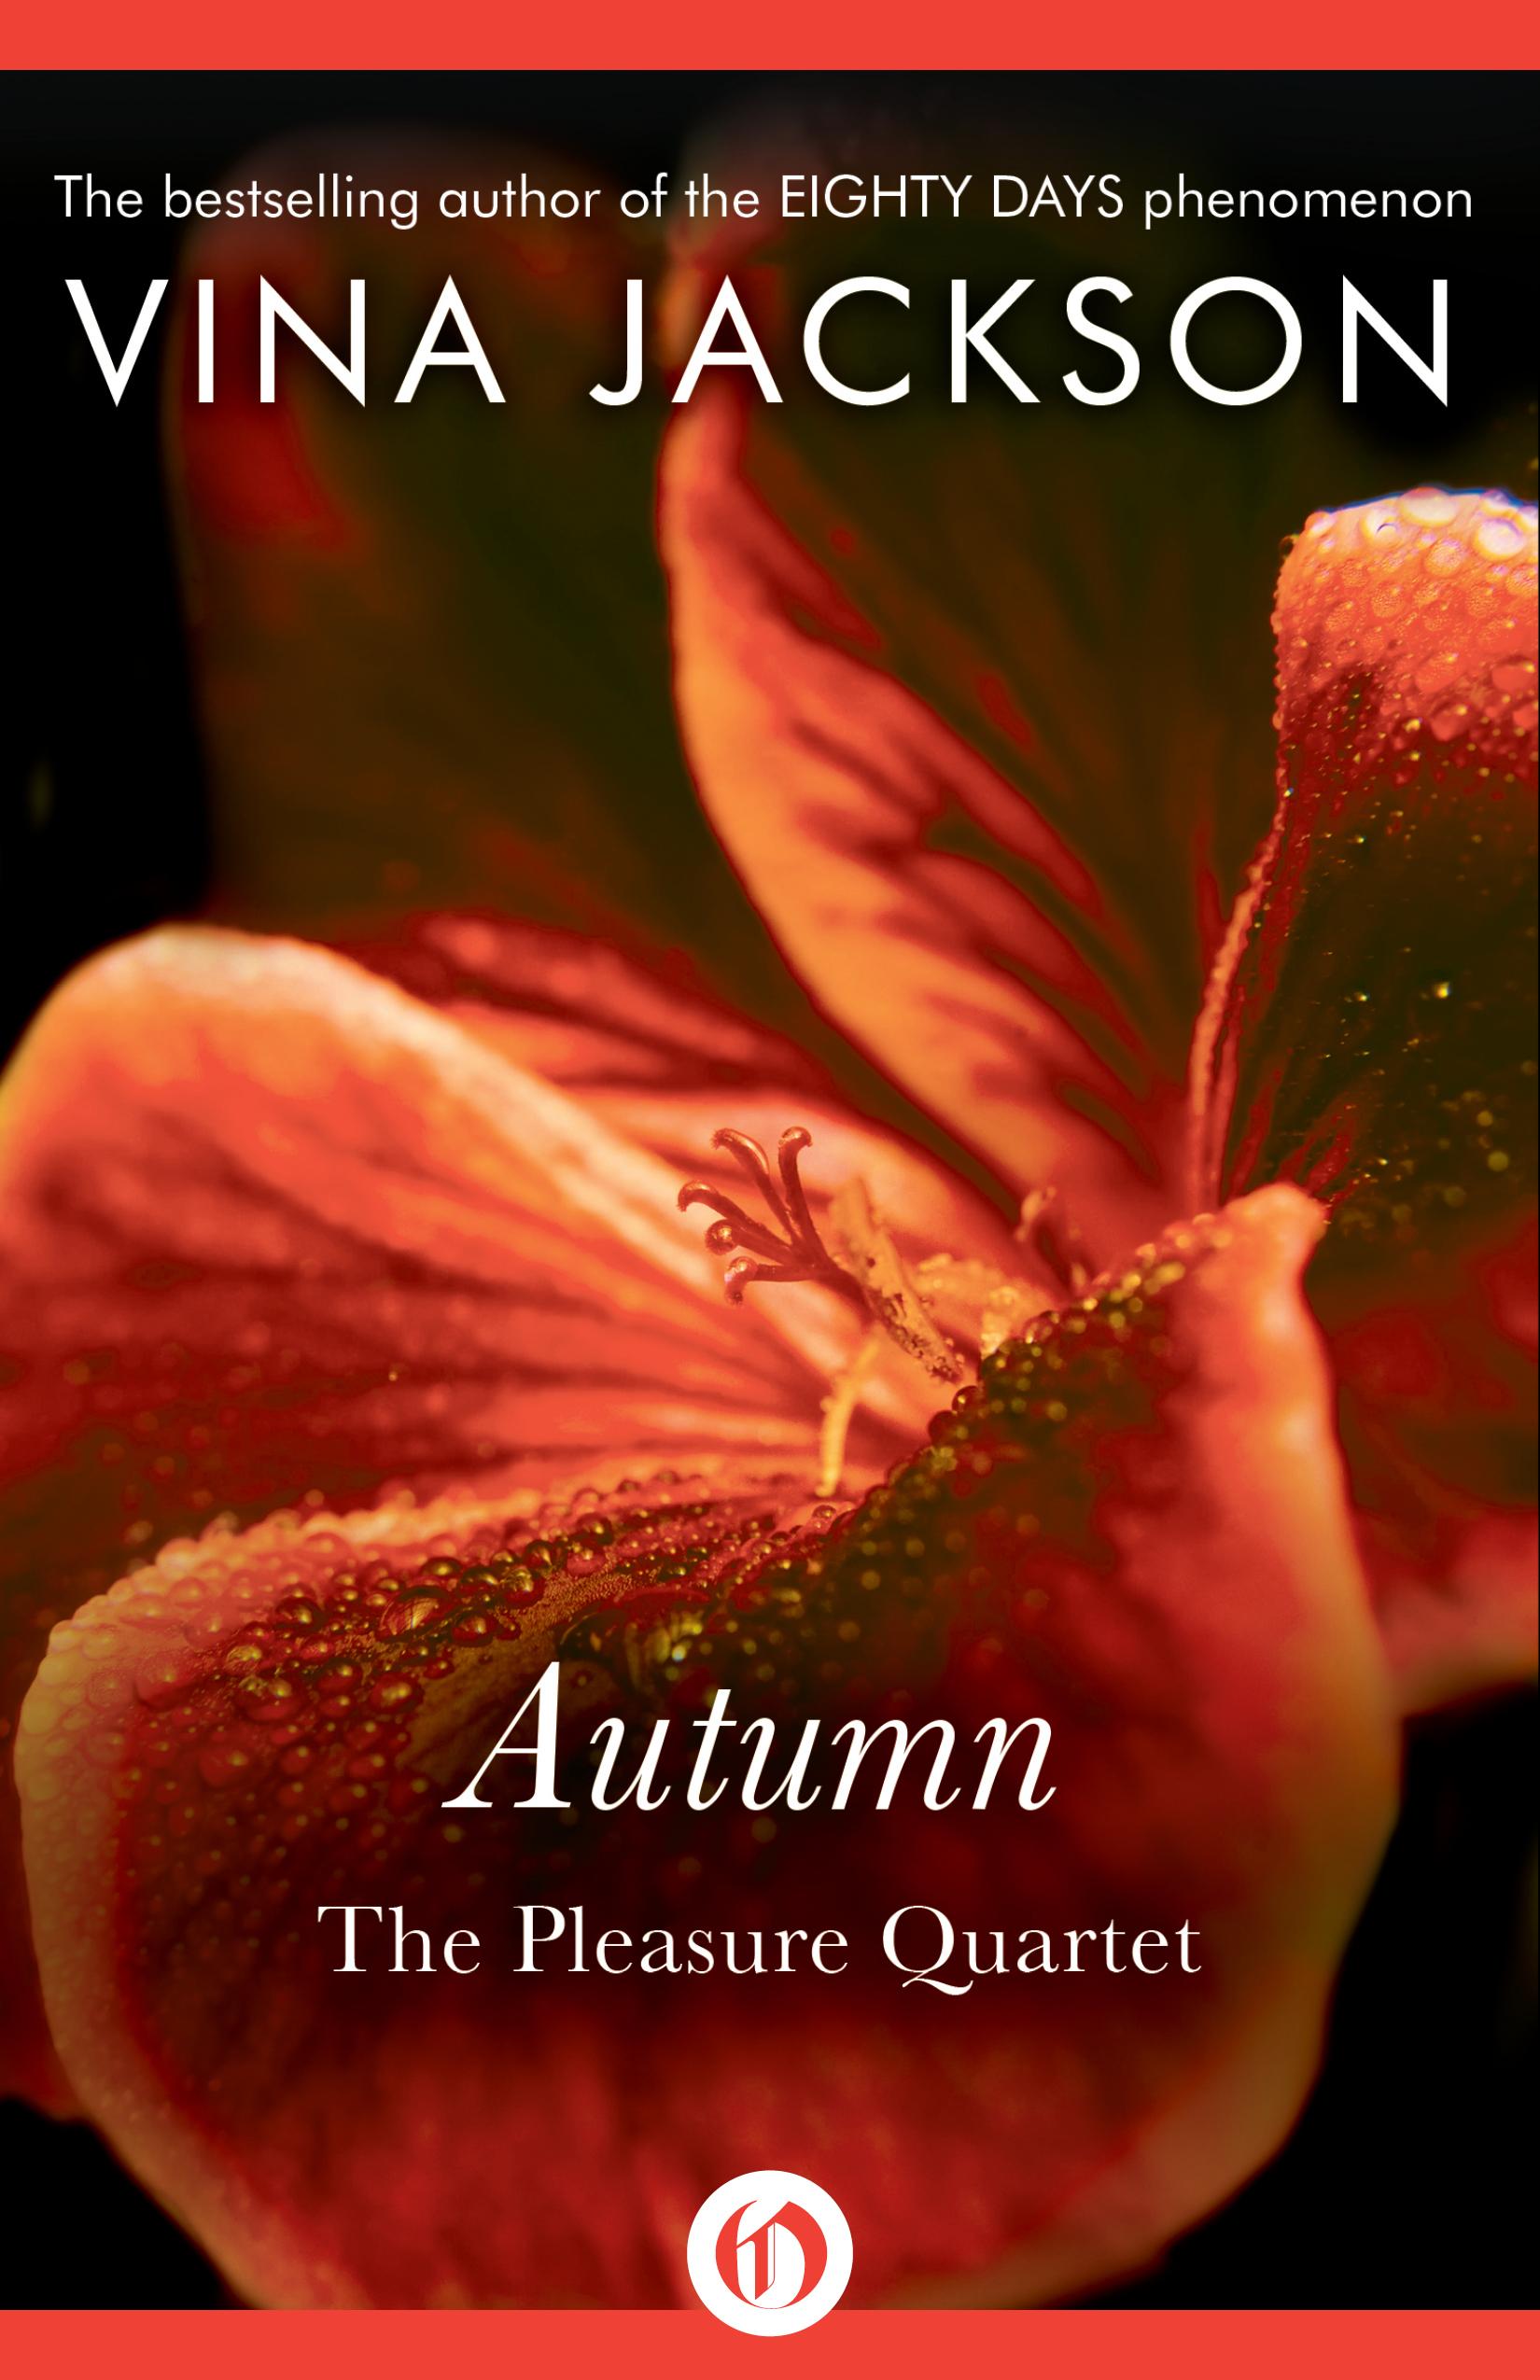 Autumn (4 Seasons #1)  by  Vina Jackson